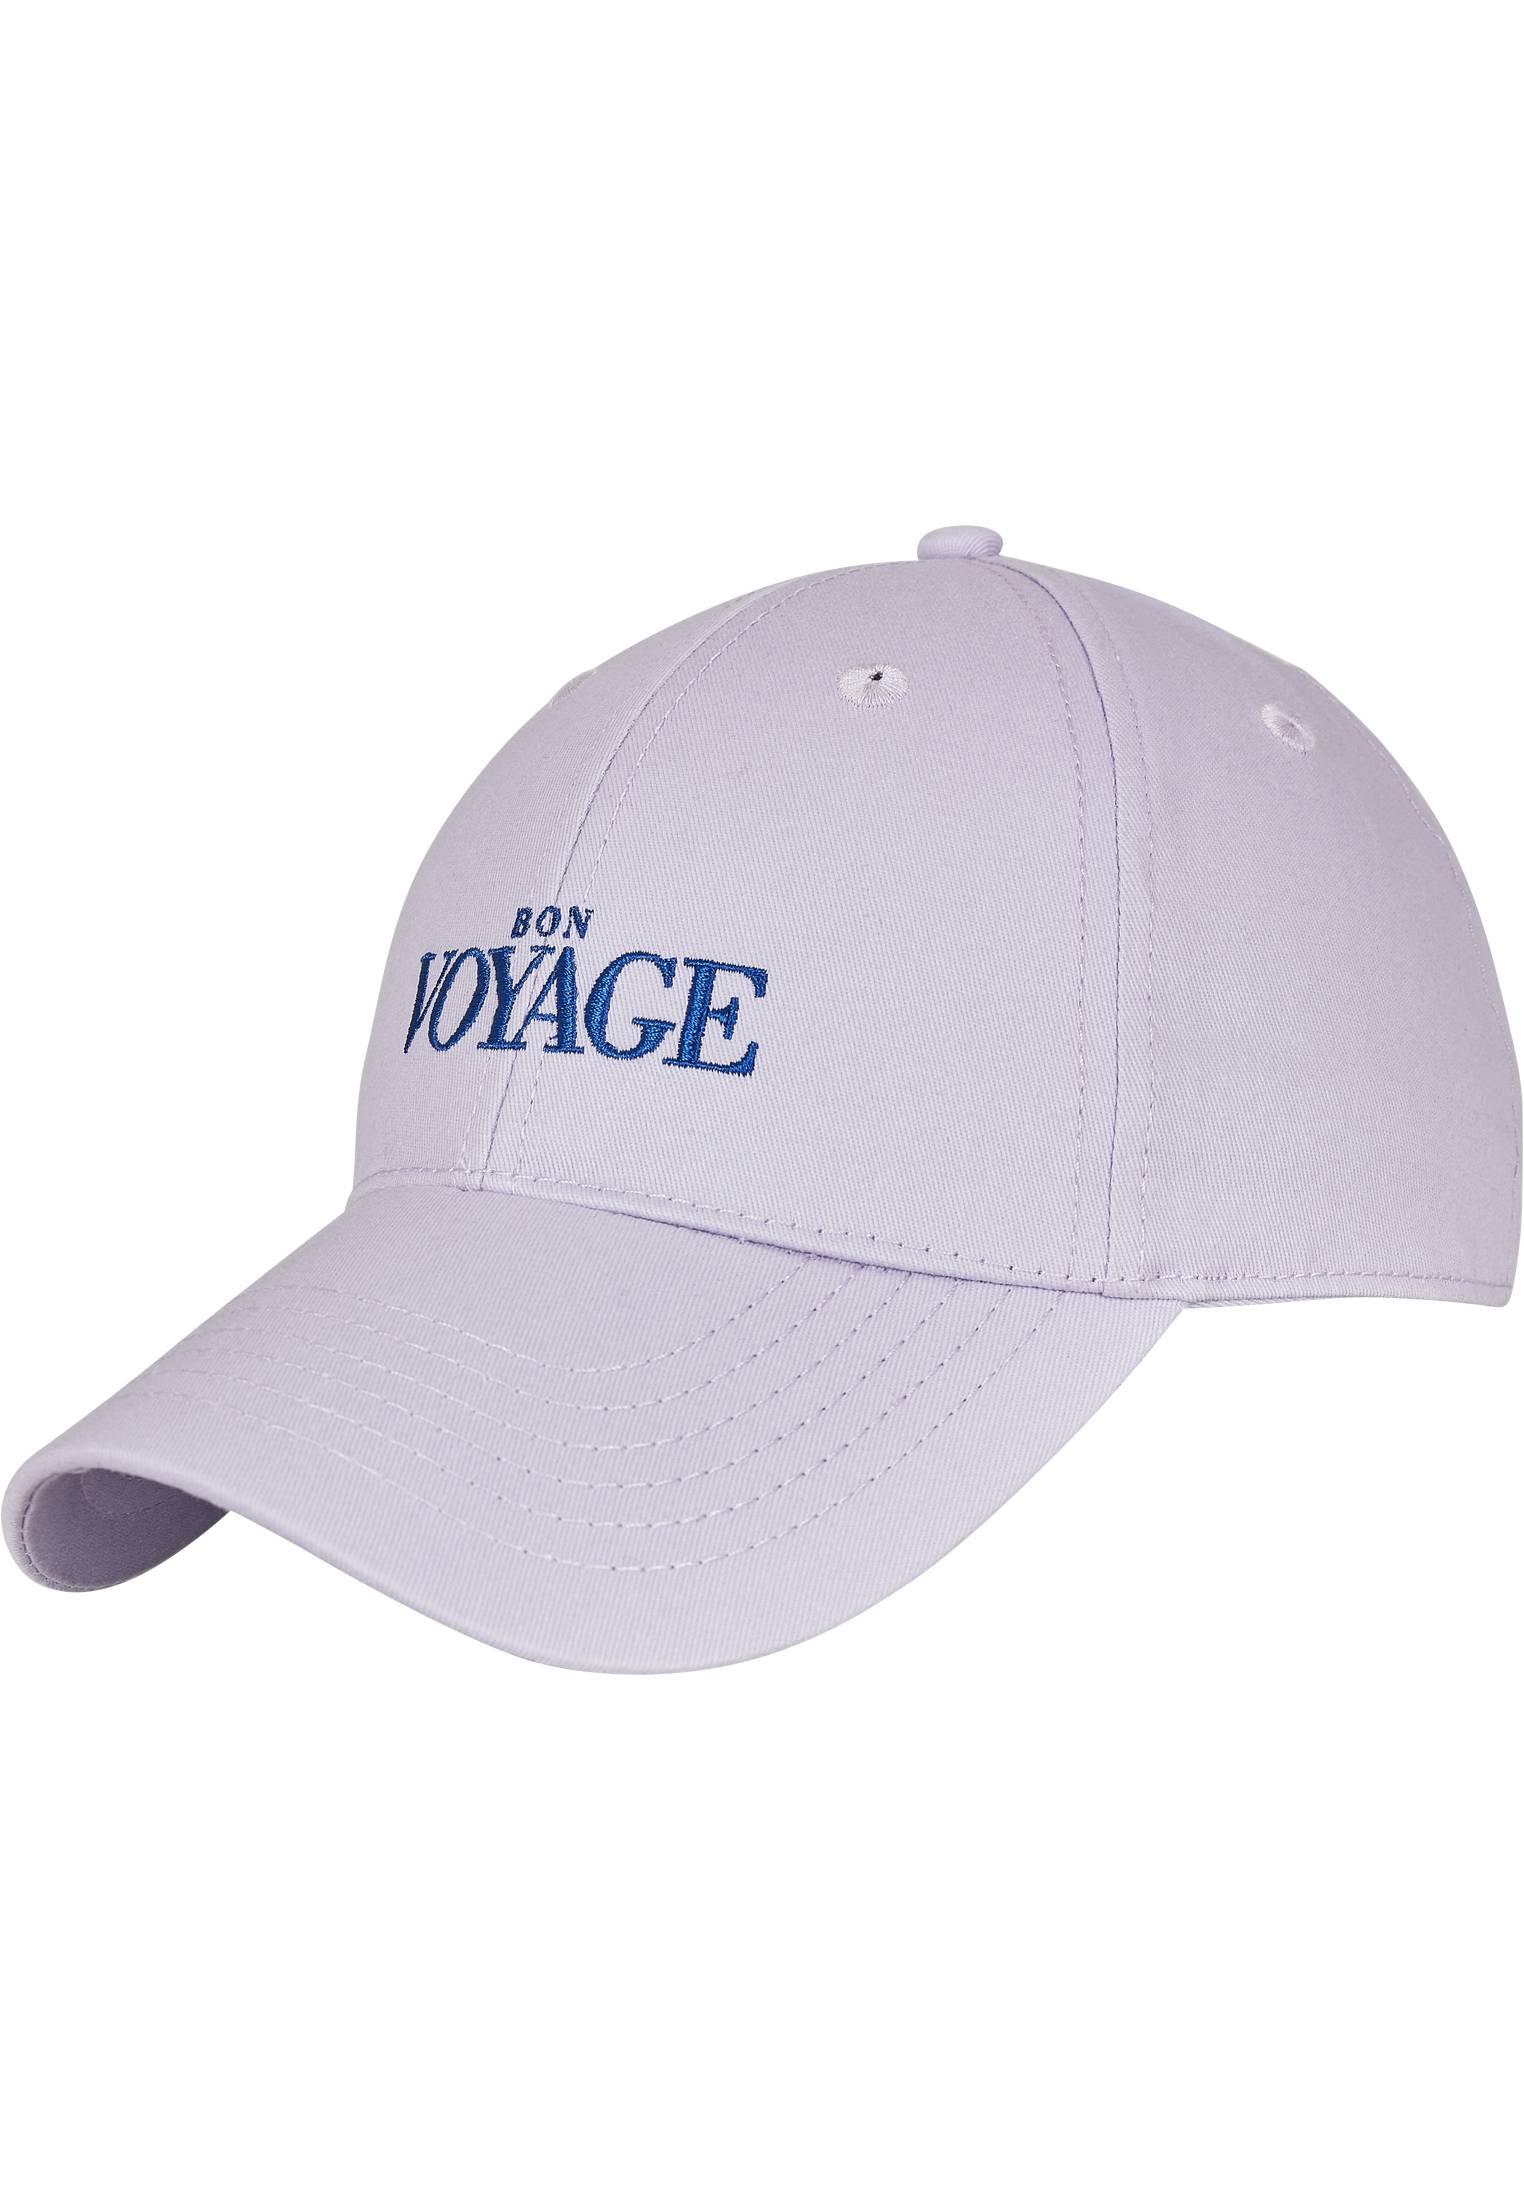 Urban Classics C&S WL Bon Voyage Curved Cap pale lilac/mc - One Size